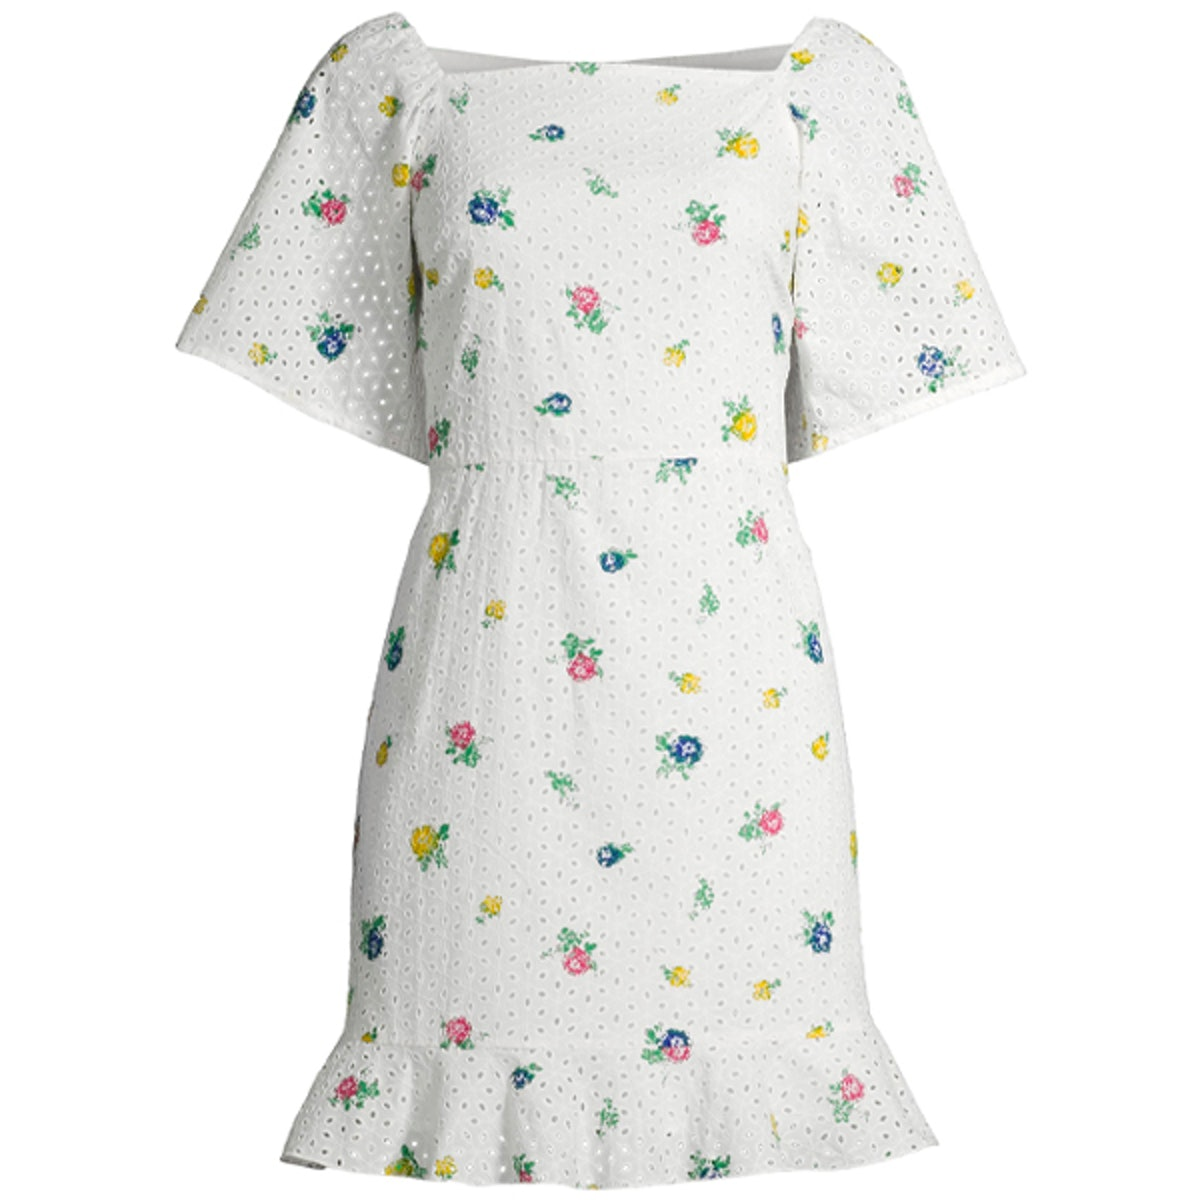 Printed Eyelet Dress